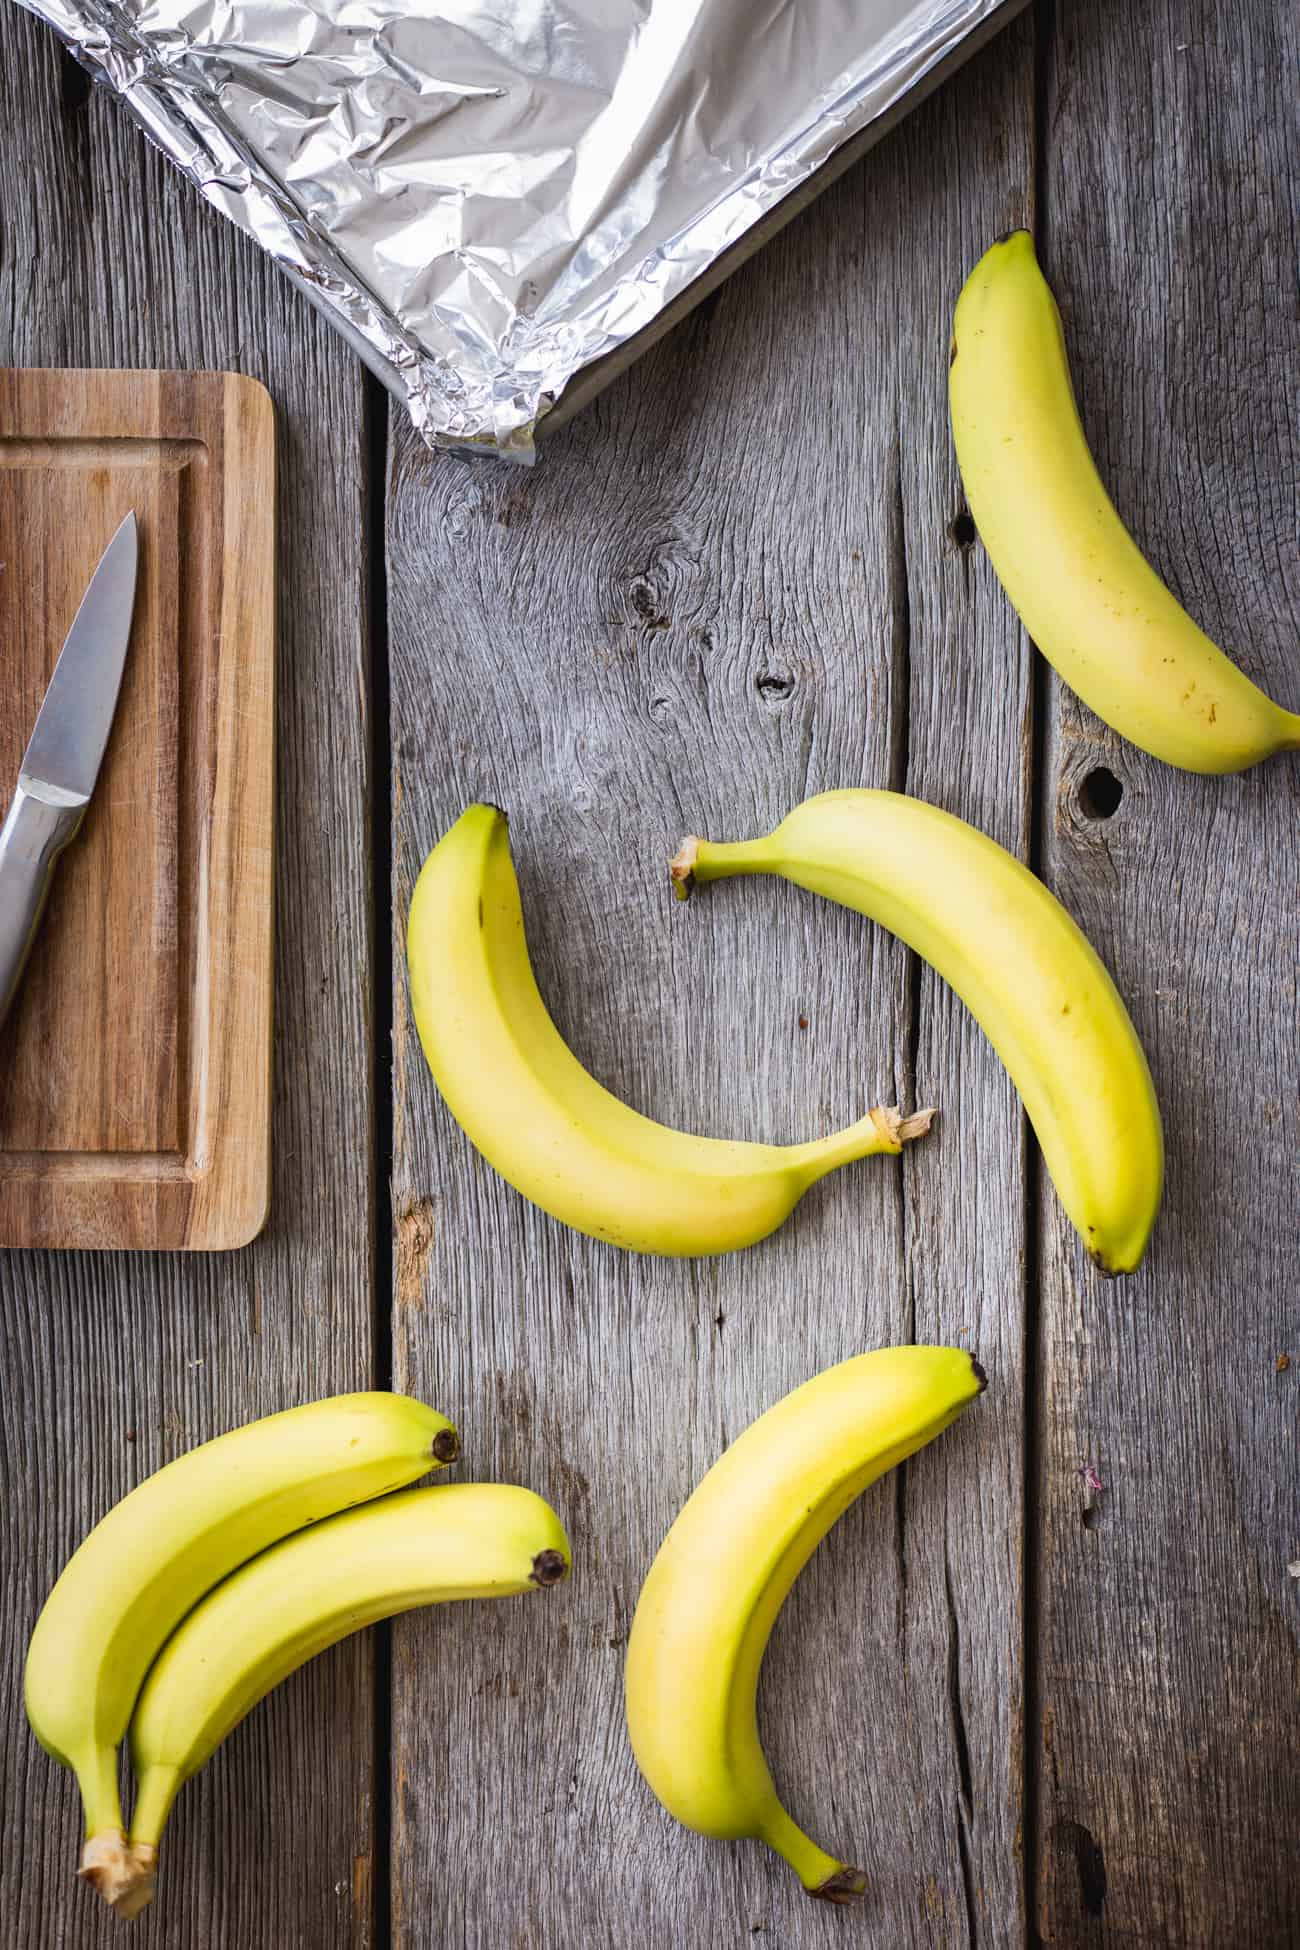 Health benefits of bananas and how to make banana tea